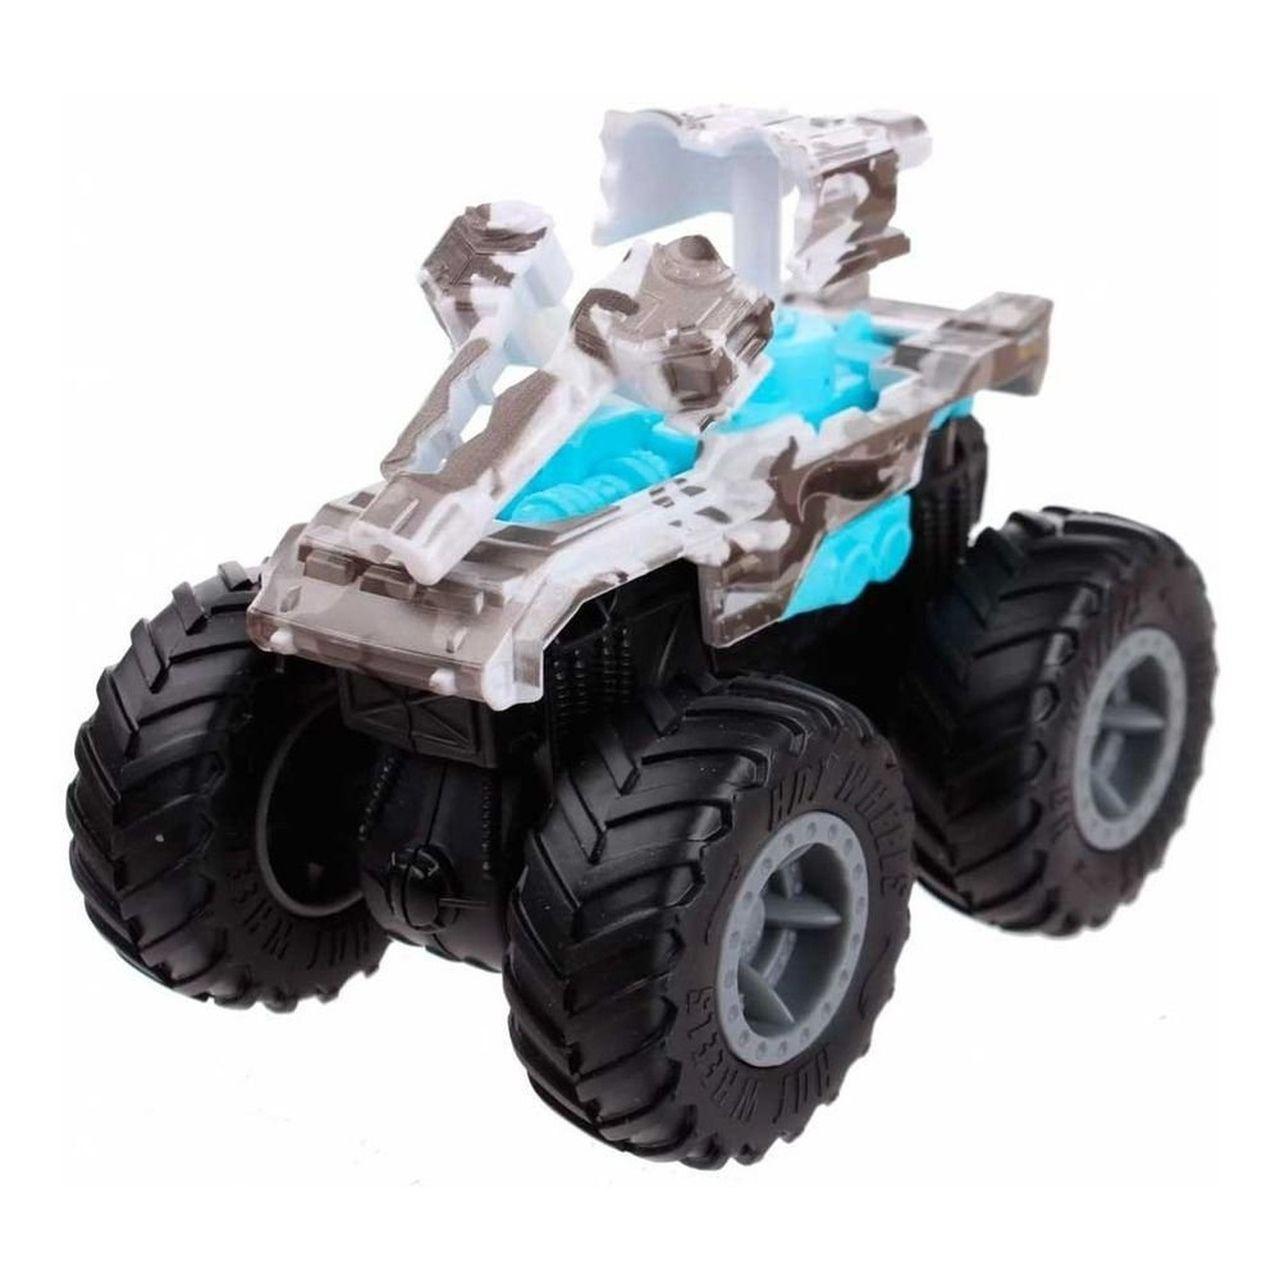 Hot Wheels Monster Truck 1:43 Invader